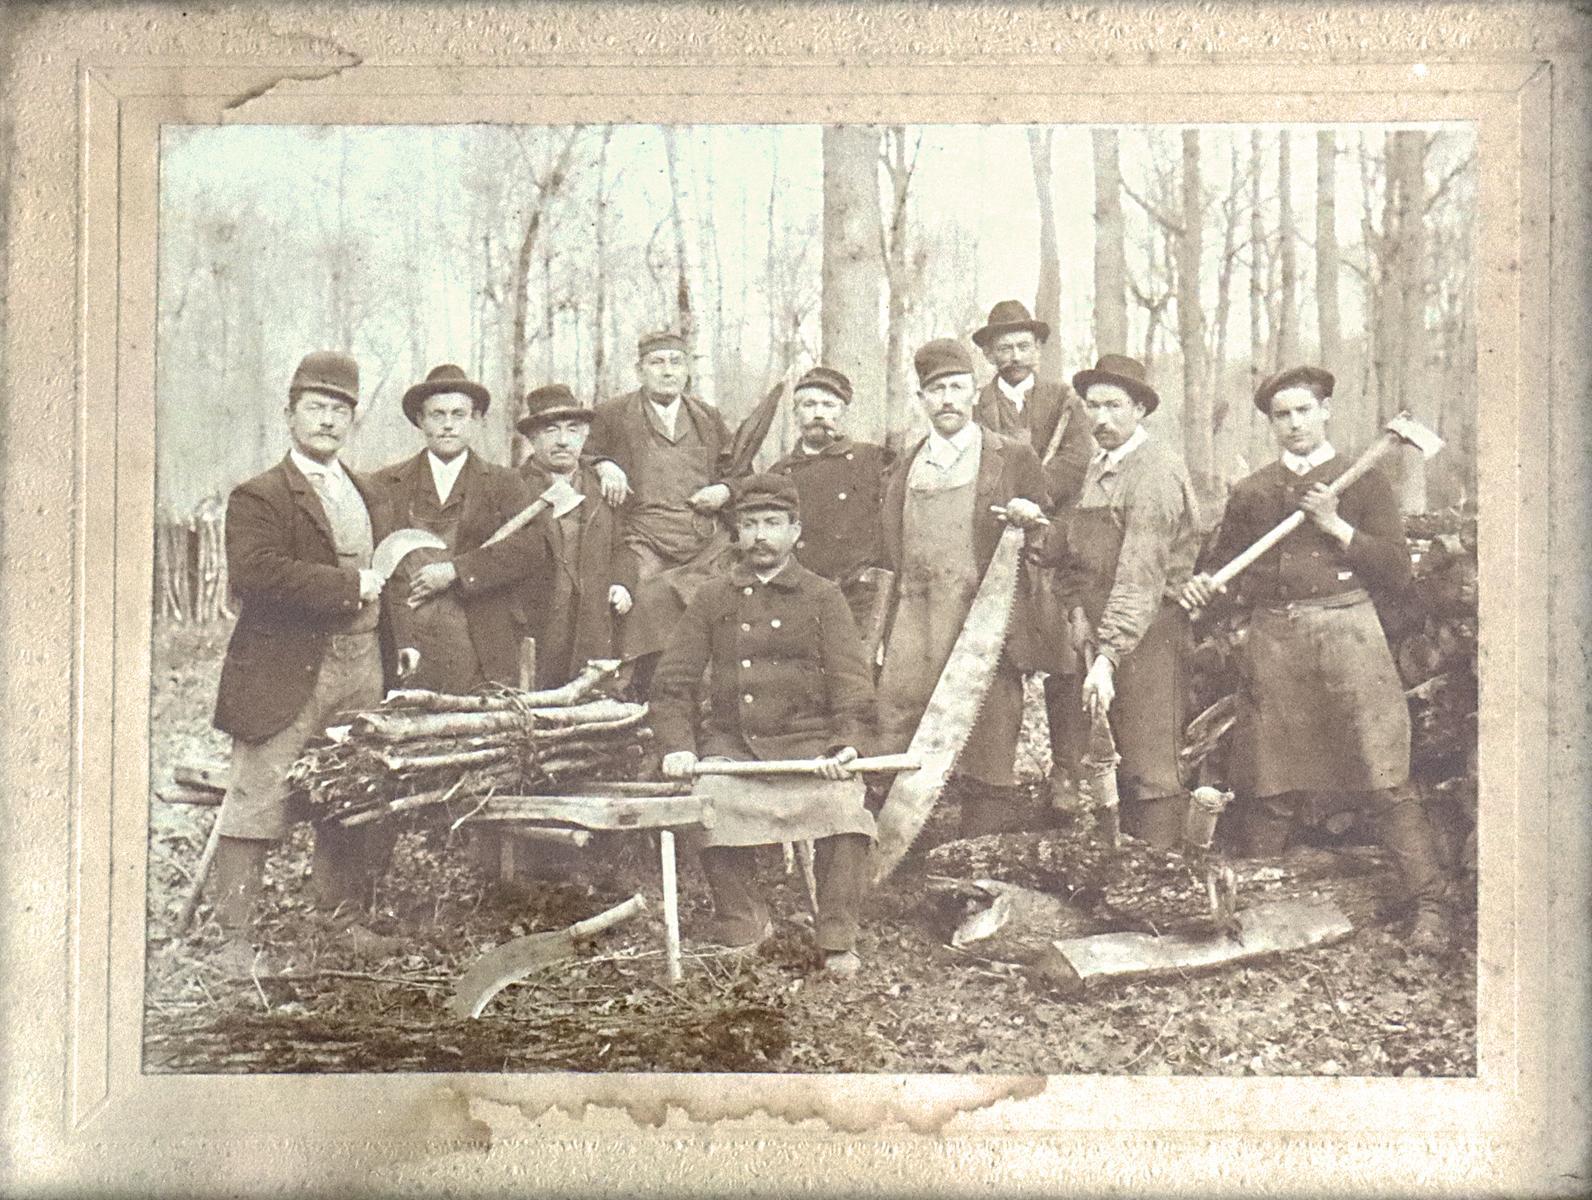 Holzmacher